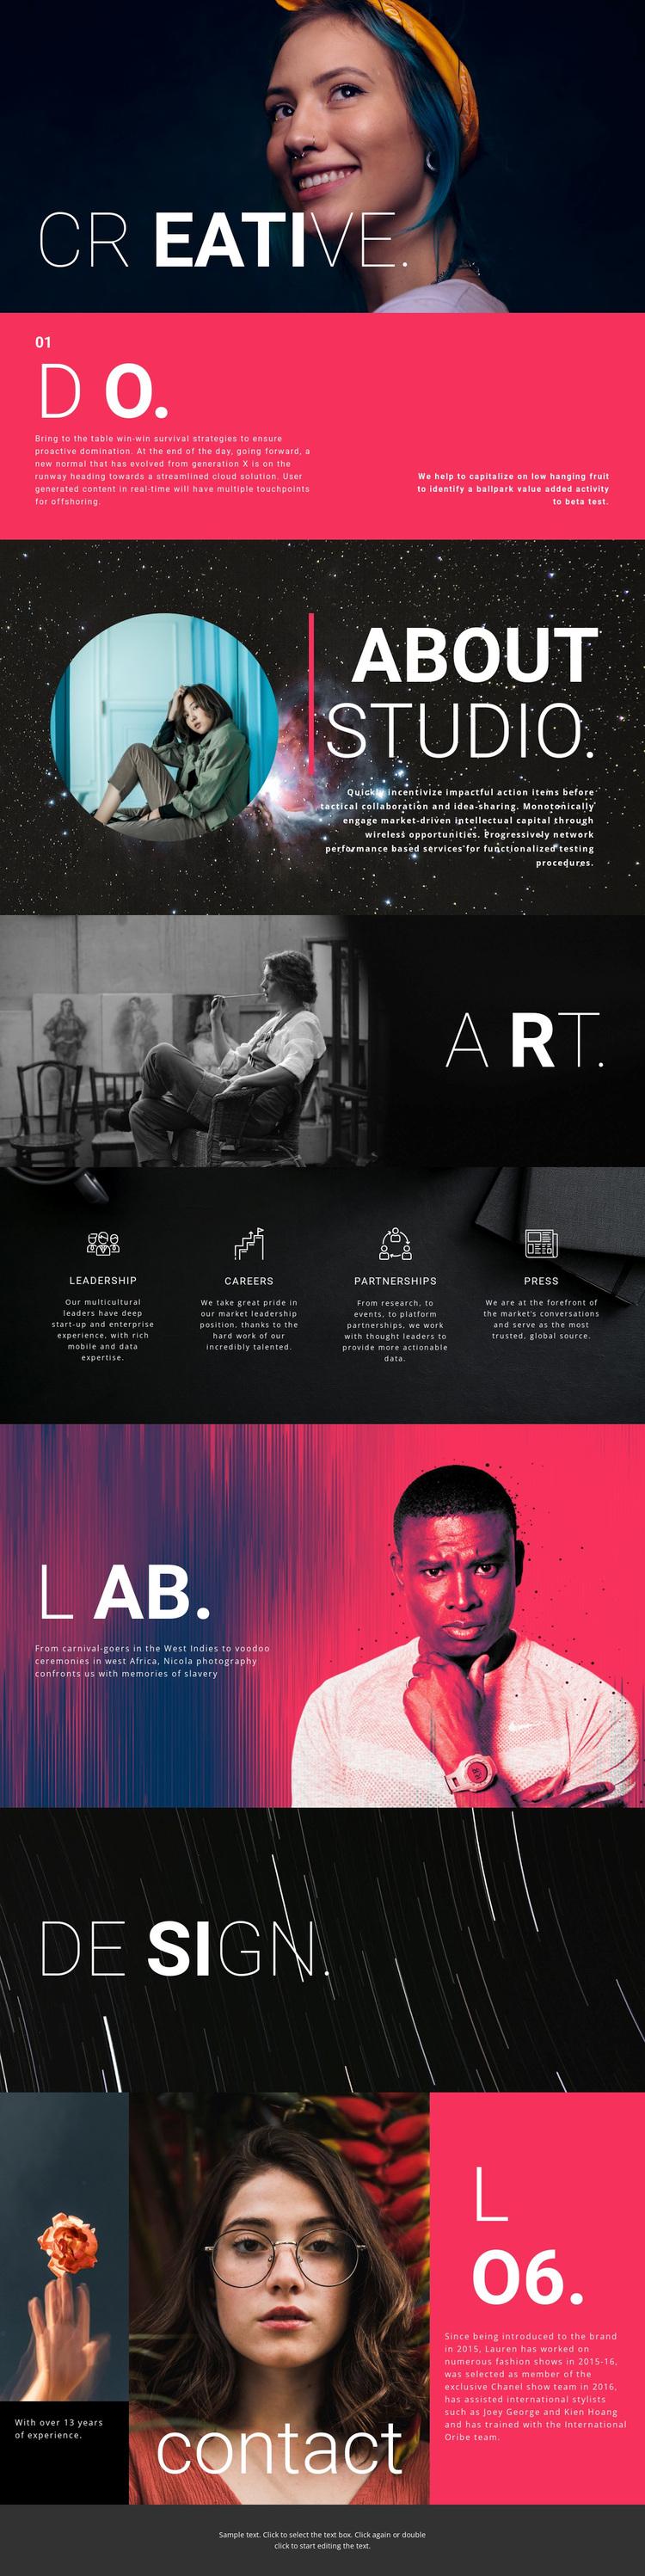 Creative design studio Template